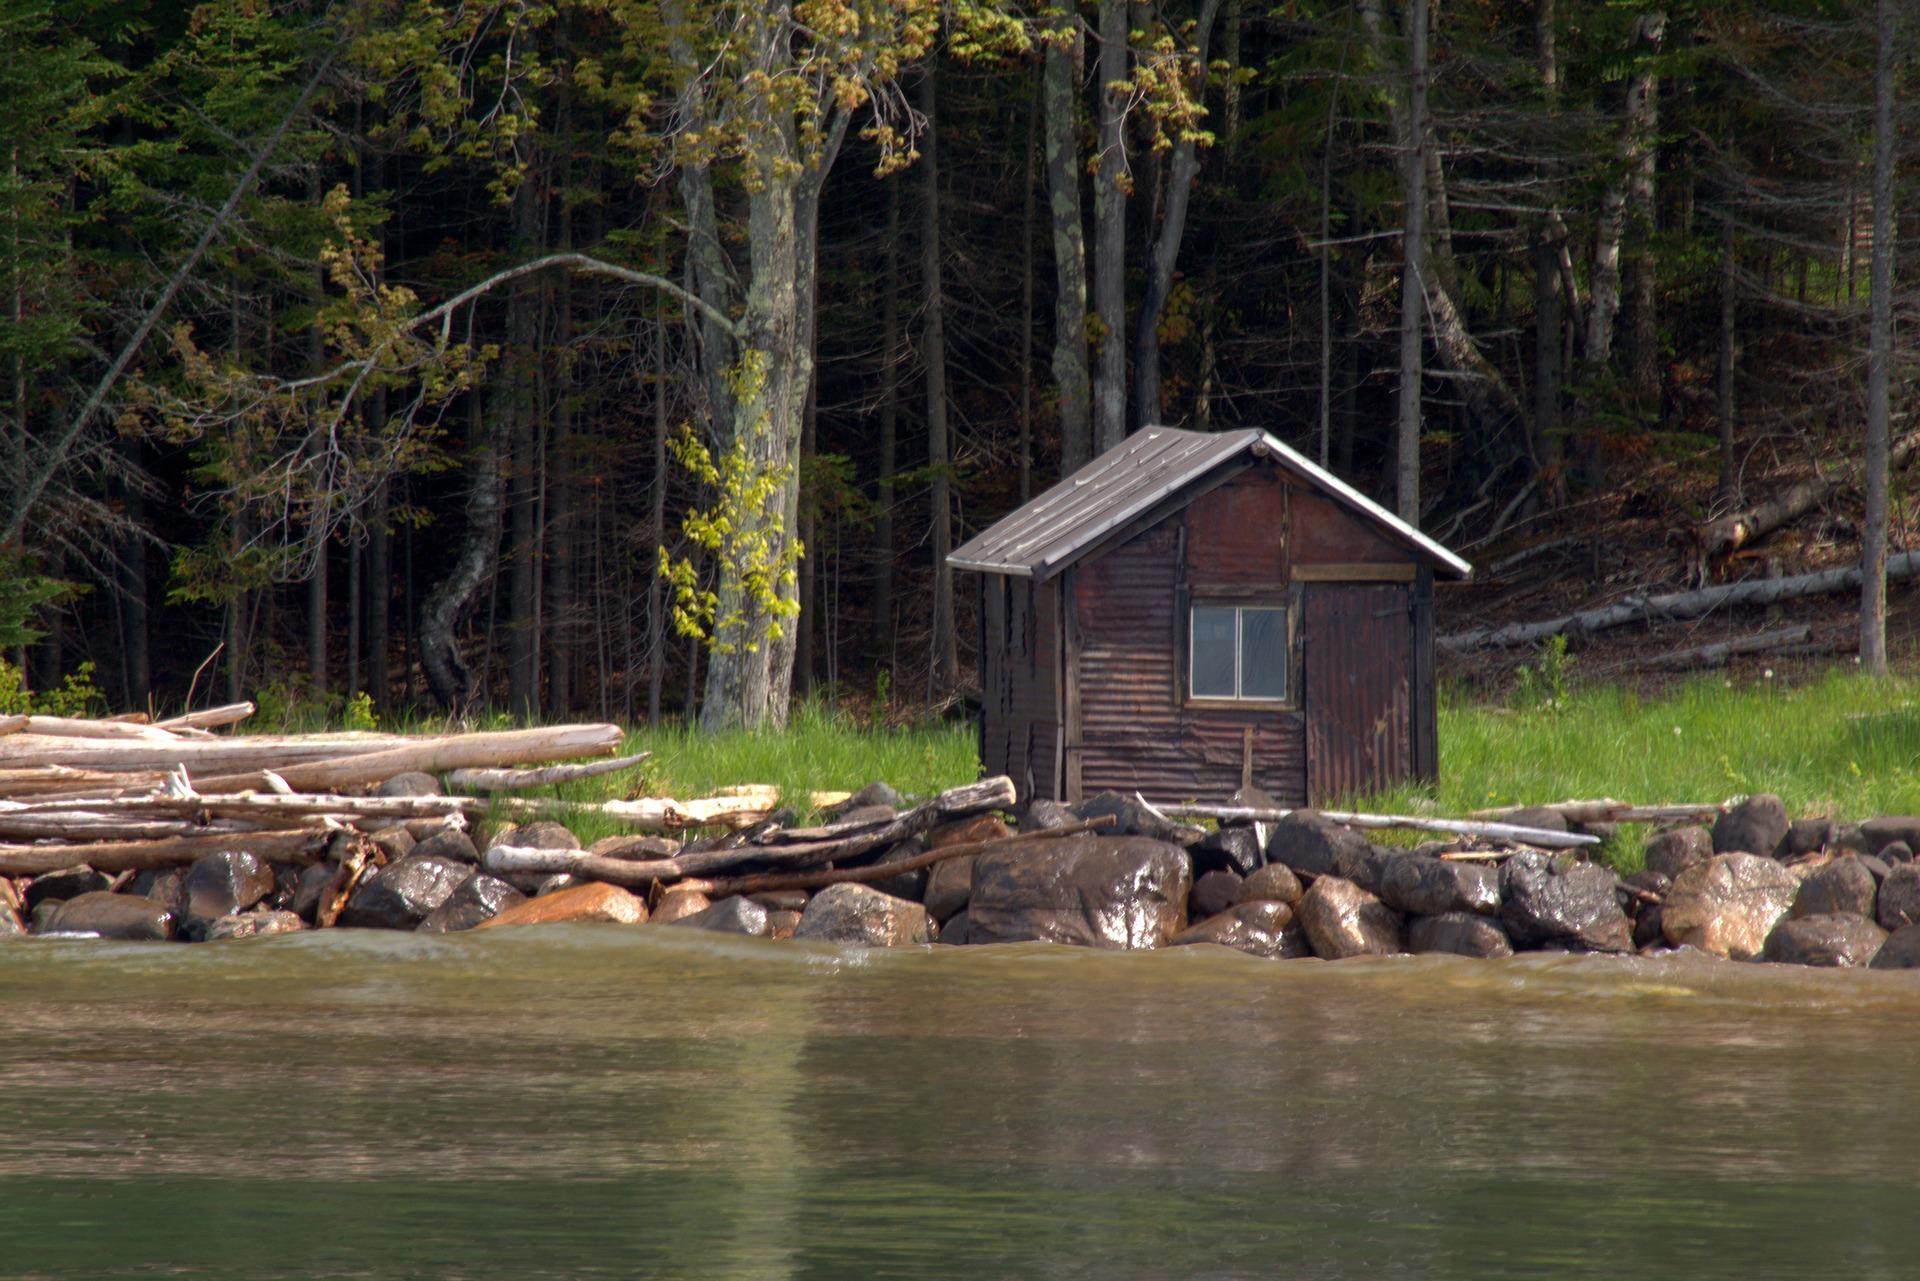 manitou-island-fish-camp-cabin-3532419_1920.jpg